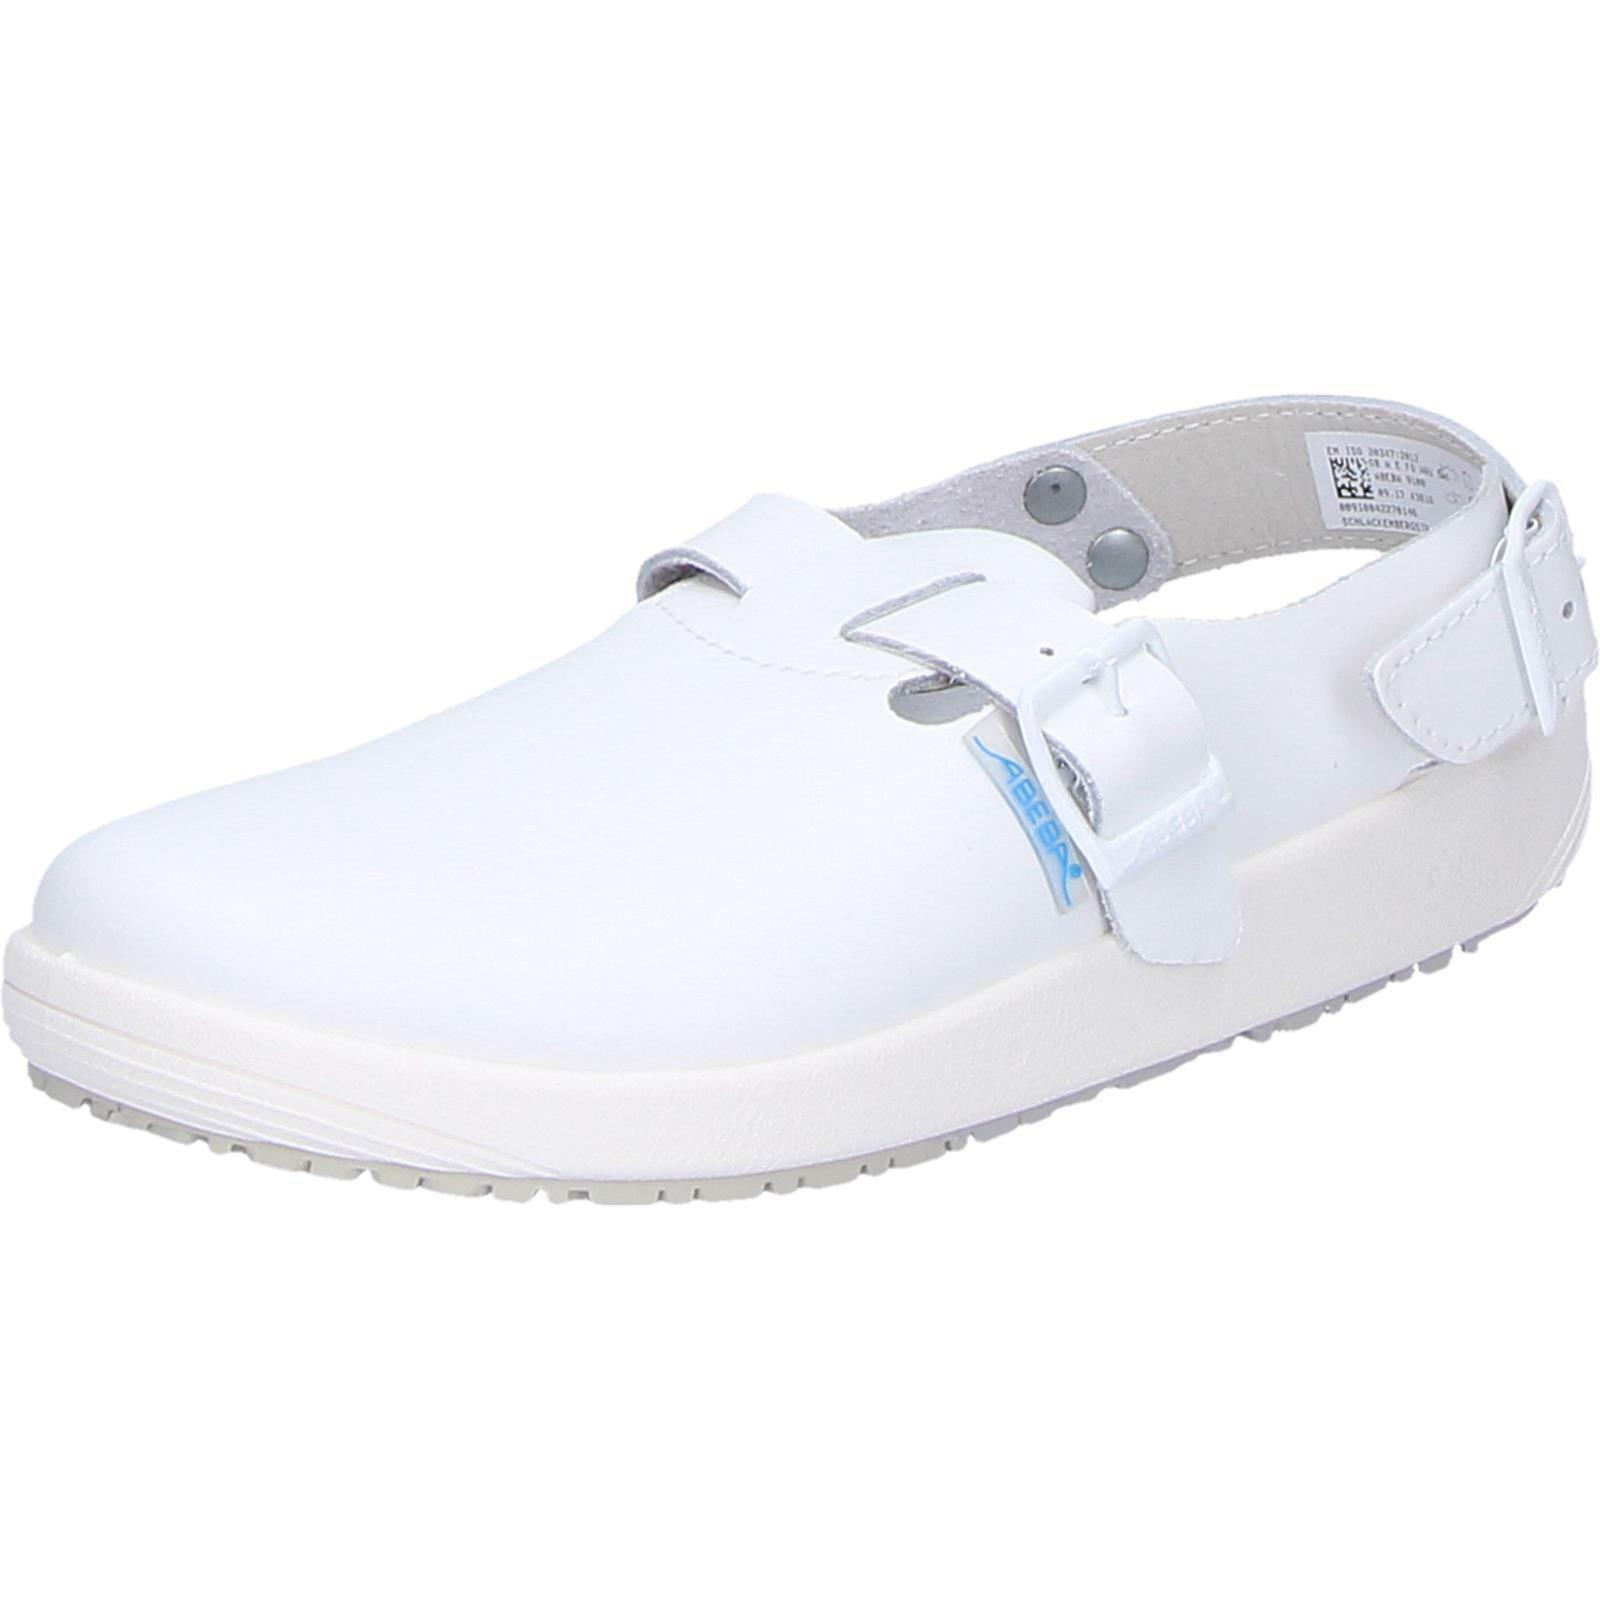 Abeba zapatos blancoo sandalia es talla 40